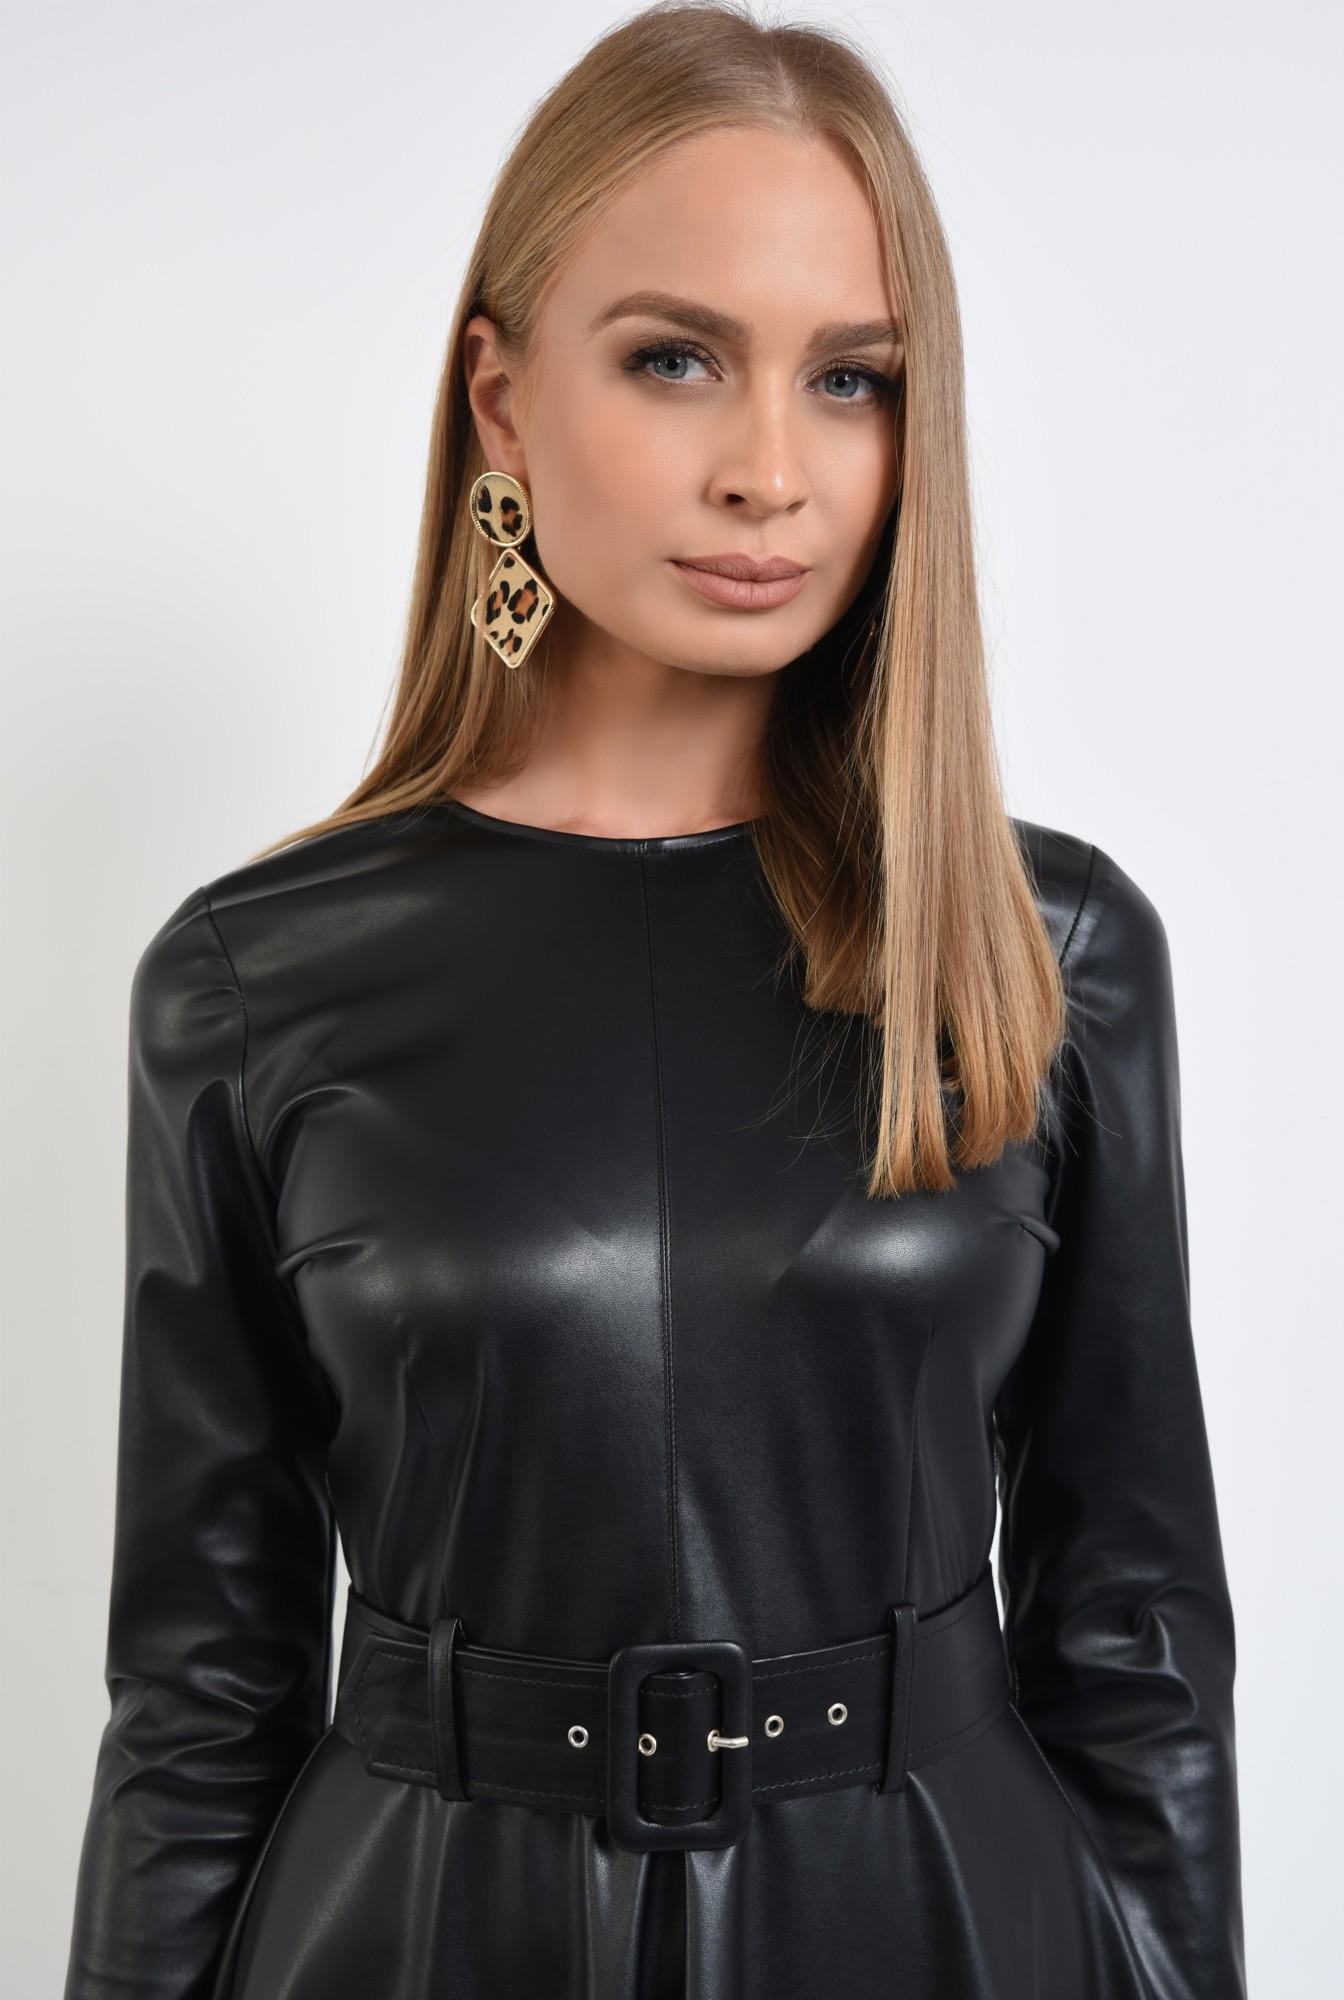 2 - rochie casual neagra, cusatura mediana, fermoar la spate, rochii online